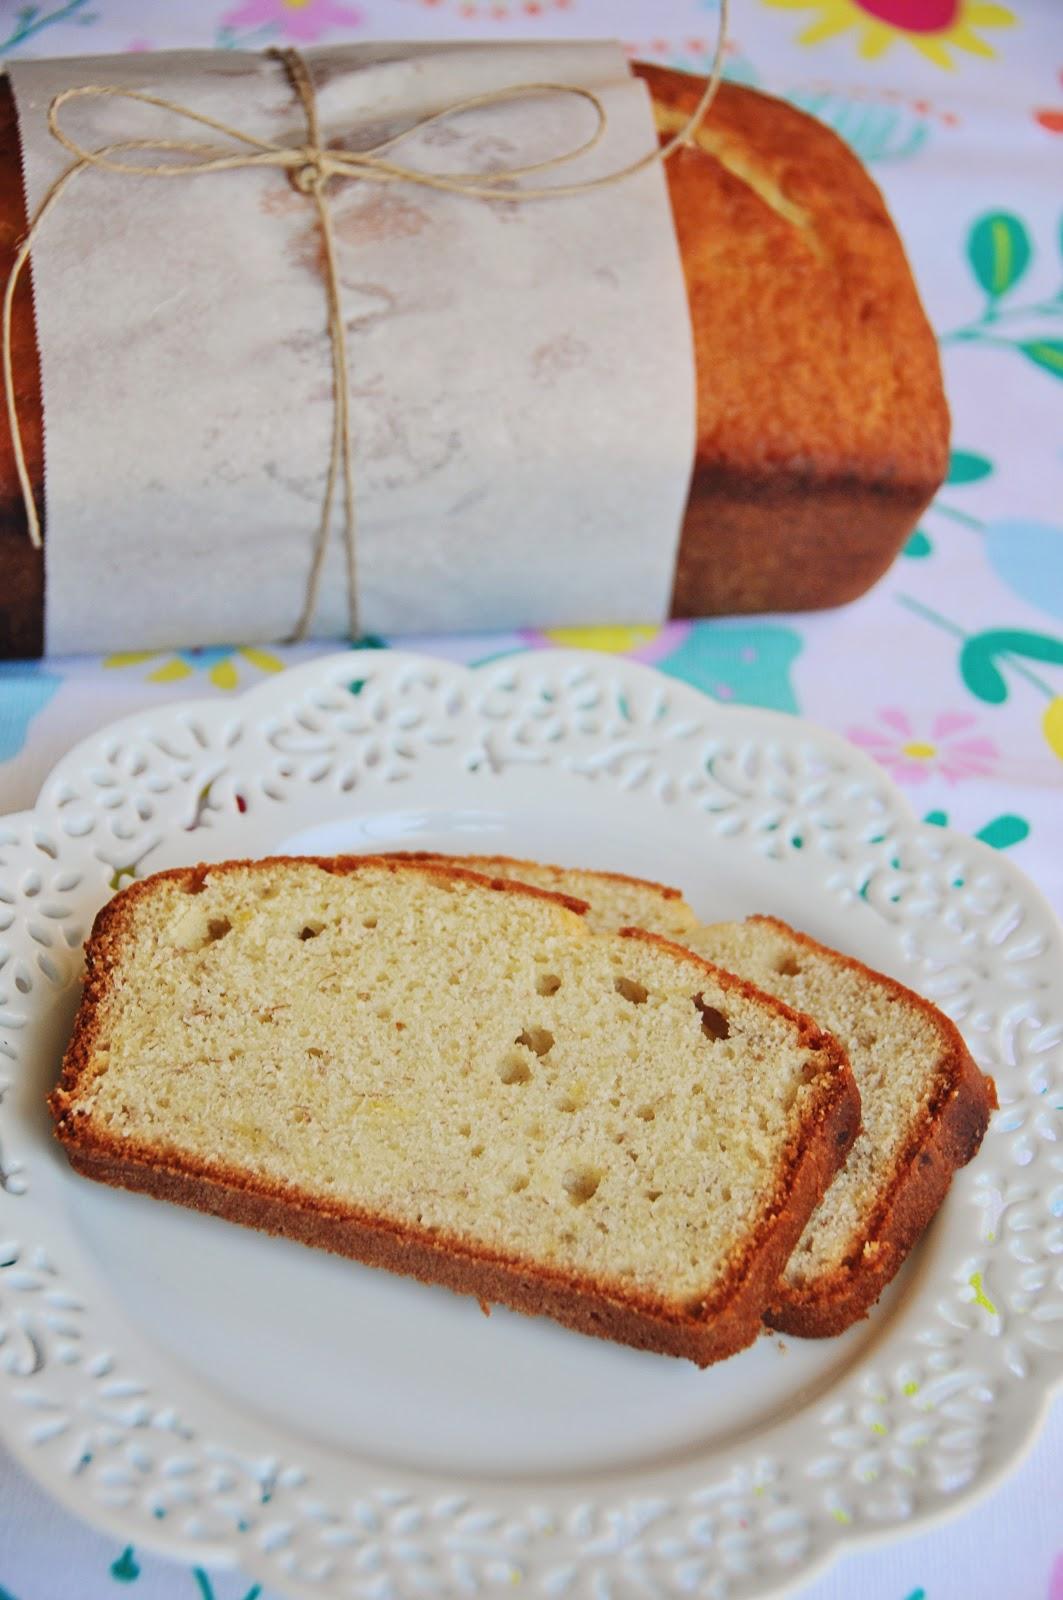 Buttermilk Banana Bread (One Loaf)